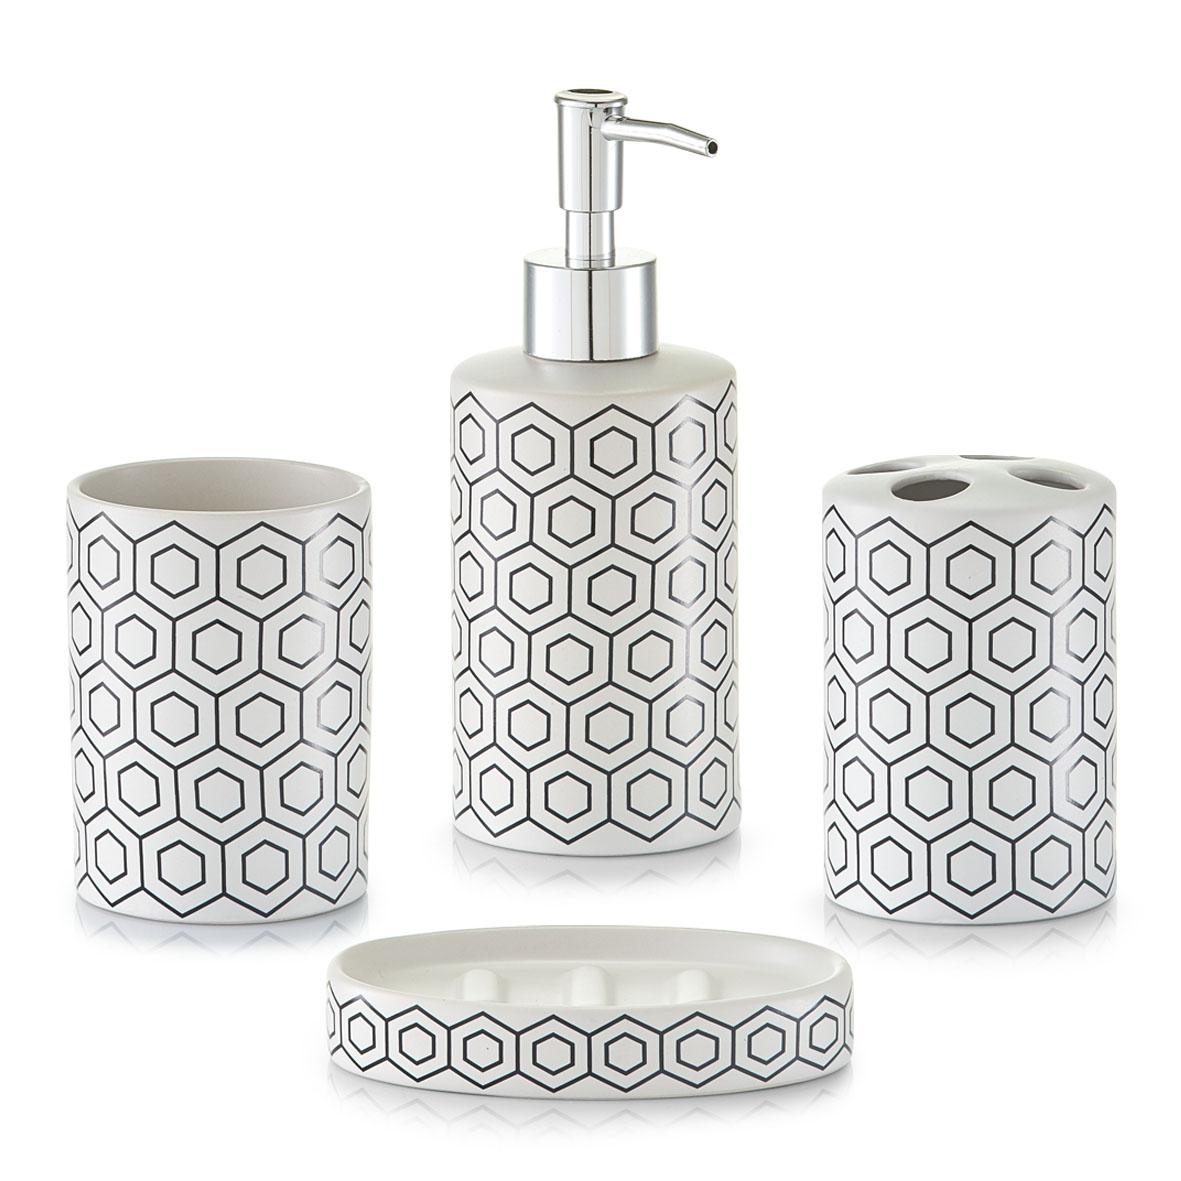 Koupelnová sada, vzor plástev, bílá, Zeller